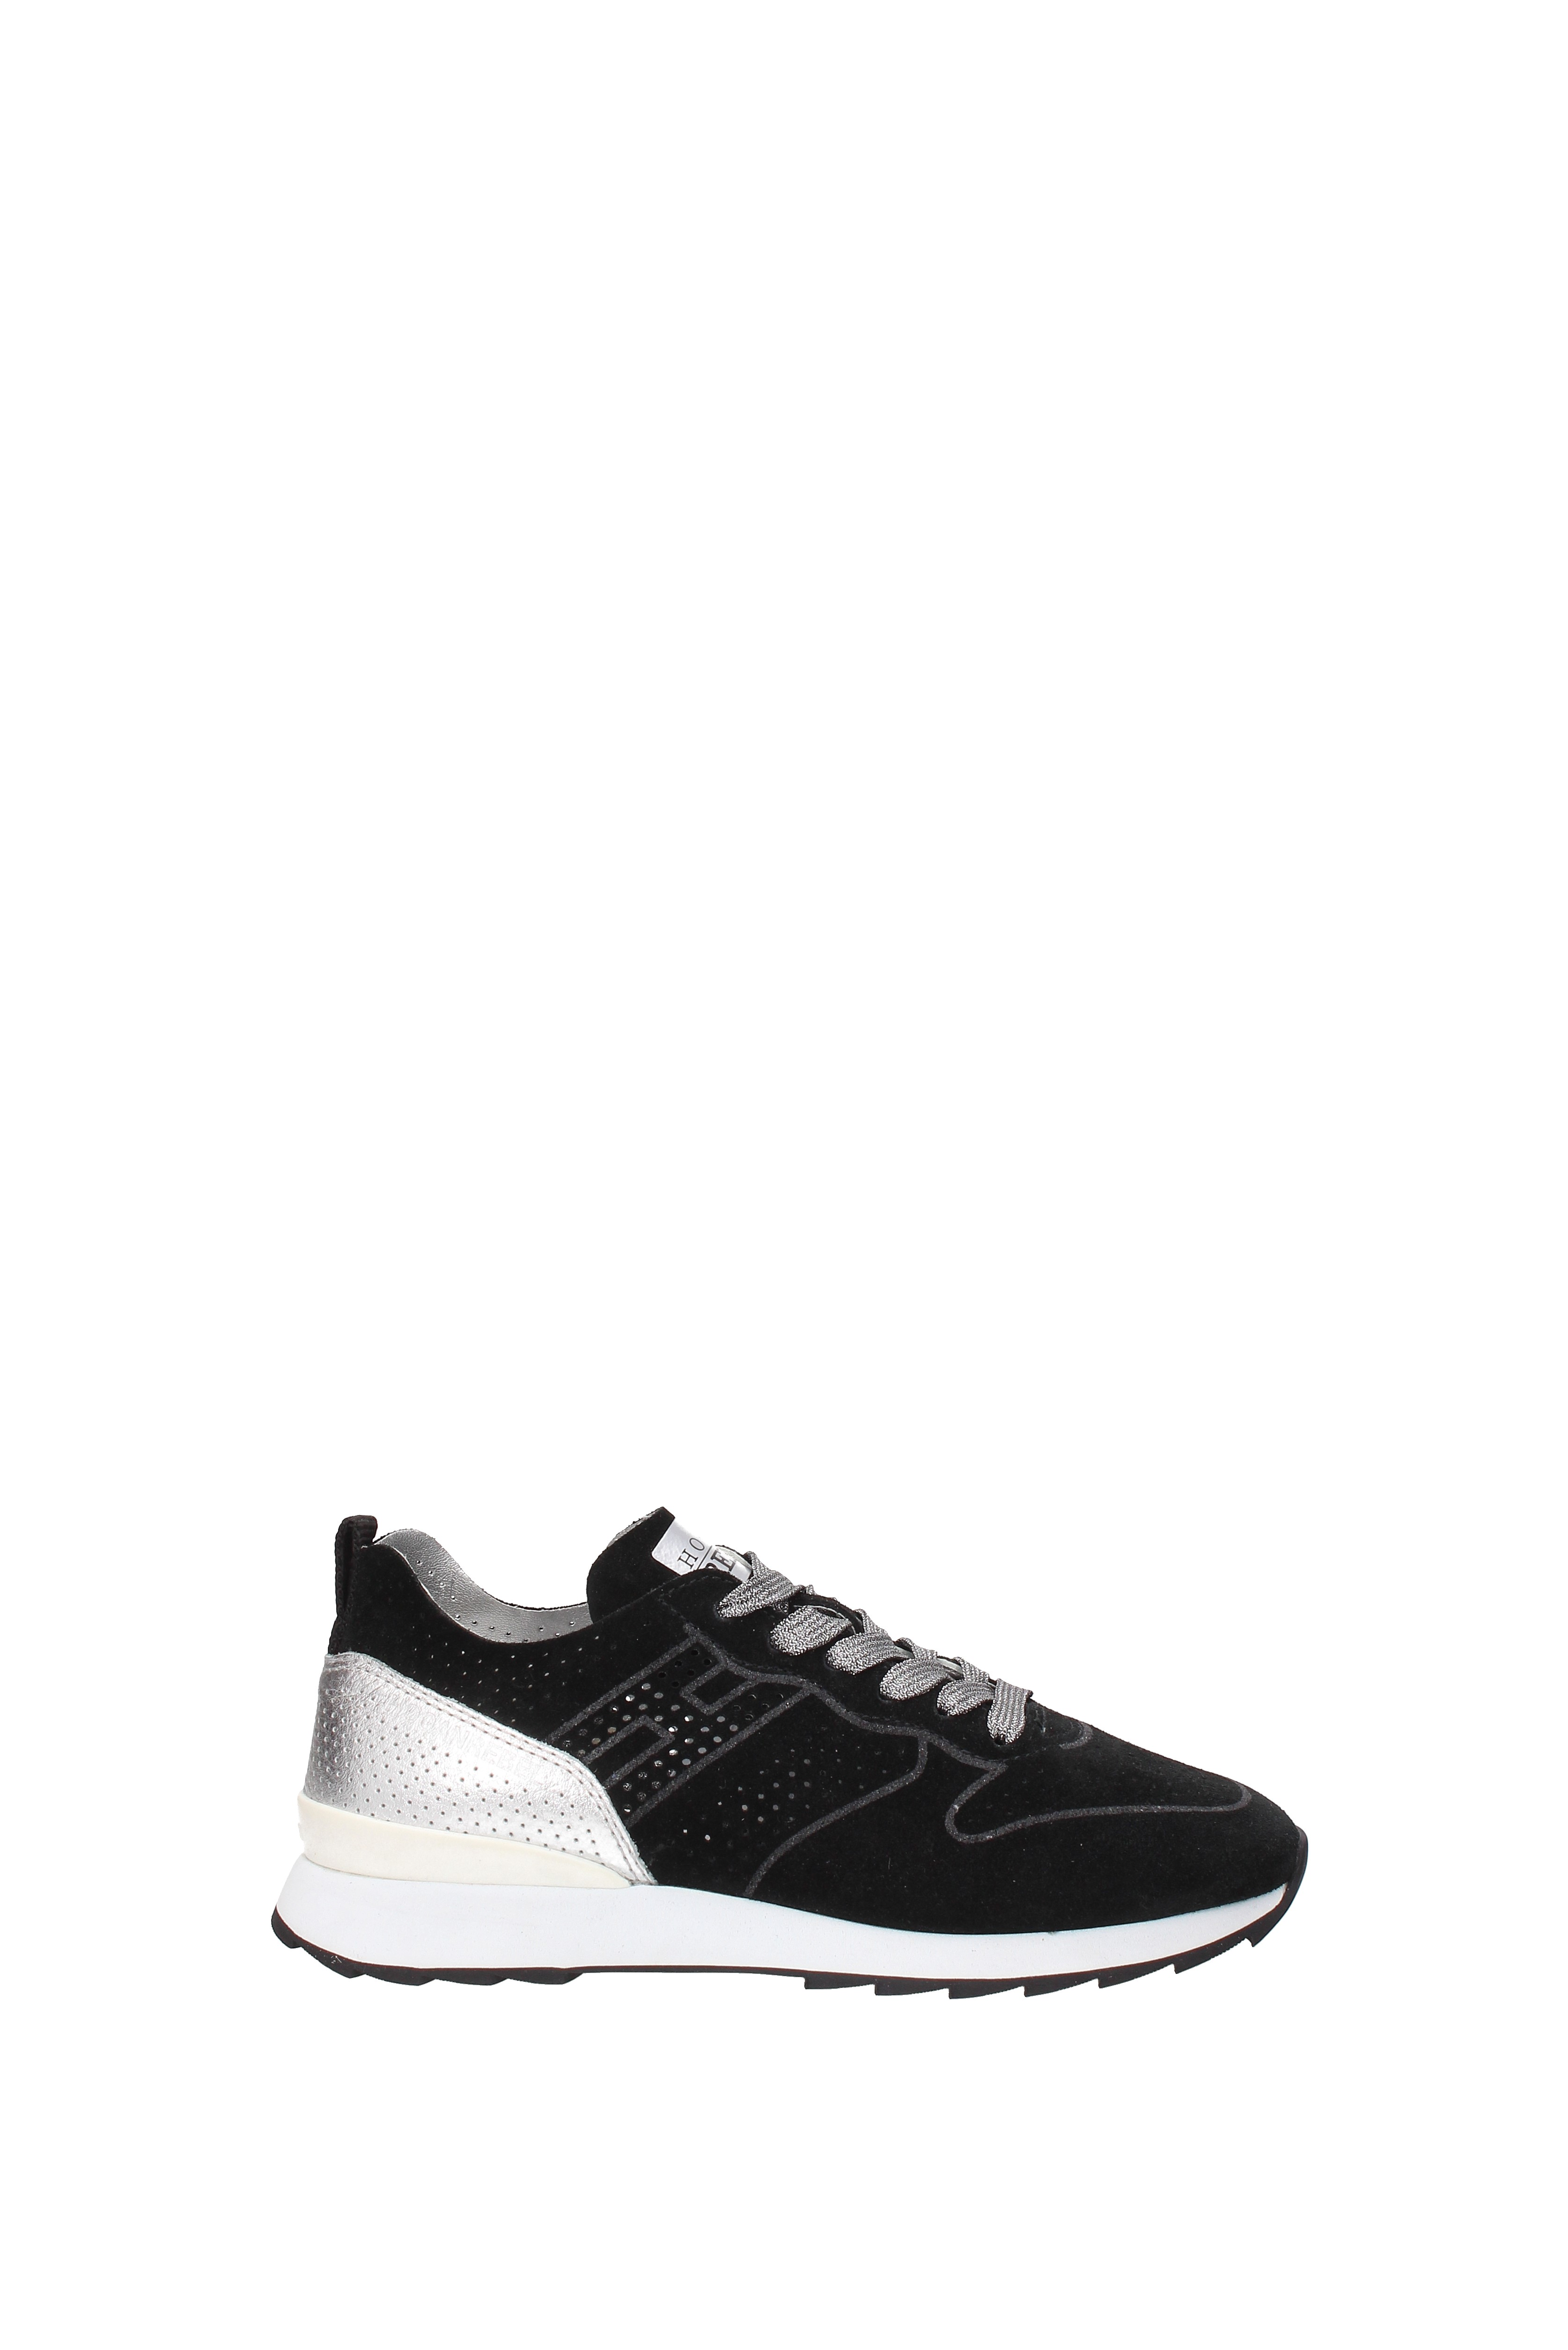 Sneakers Hogan rebel Donna Camoscio HXW2610X340FS6